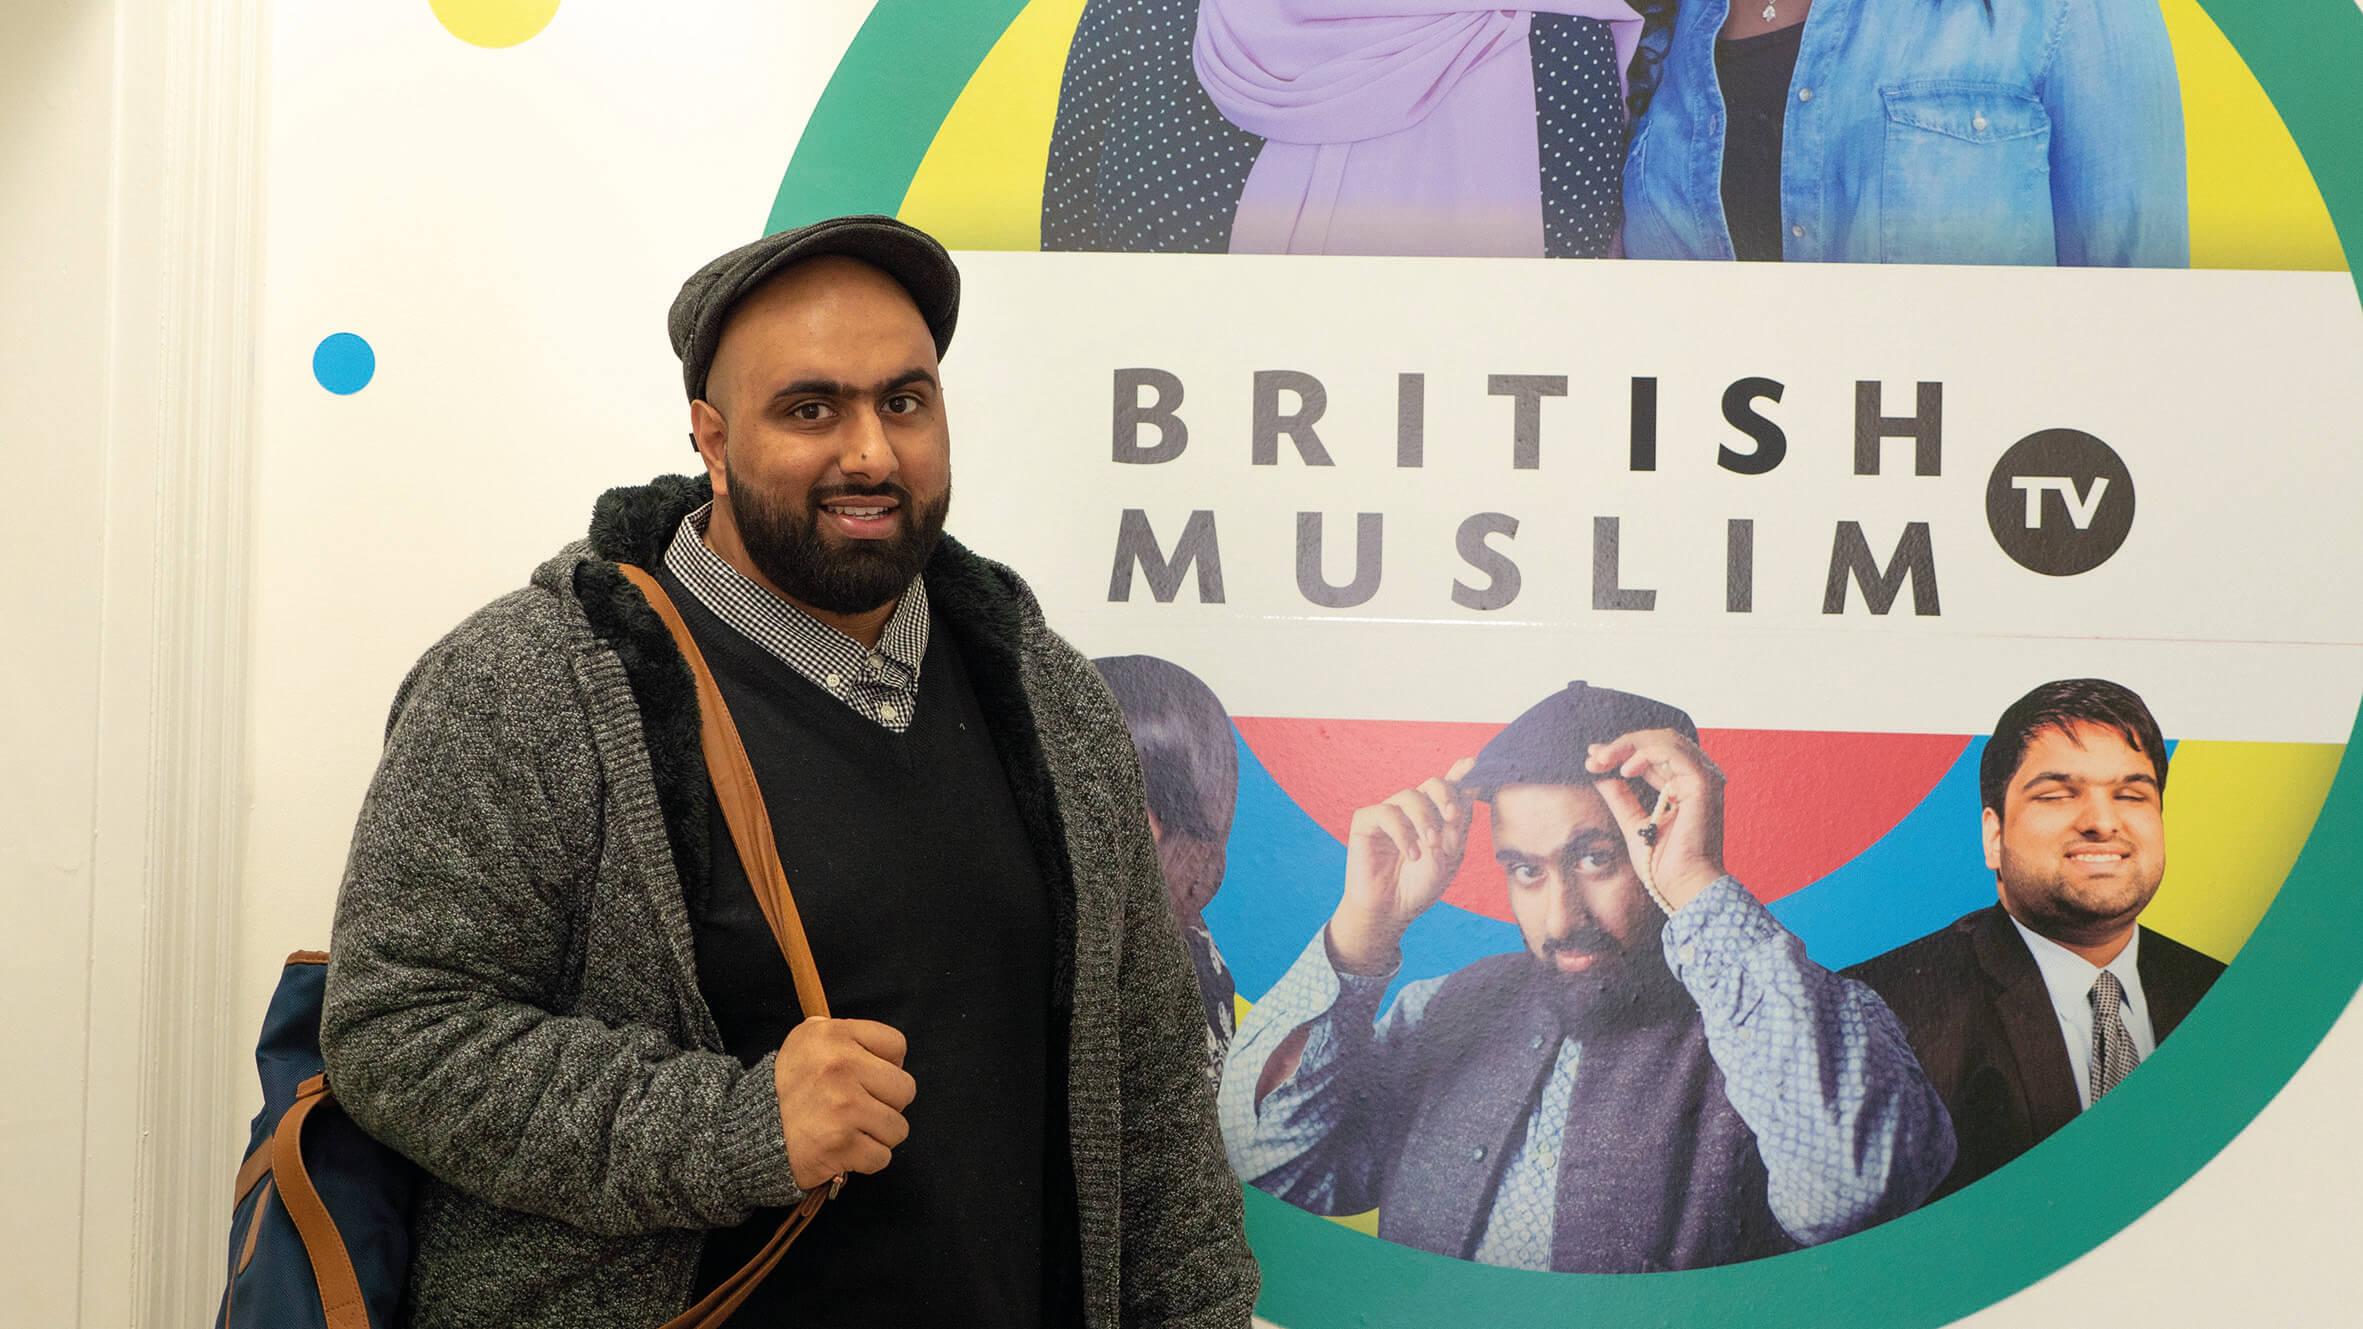 Bilal at British Muslim TV. Picture courtesy of Yee Liu Williams